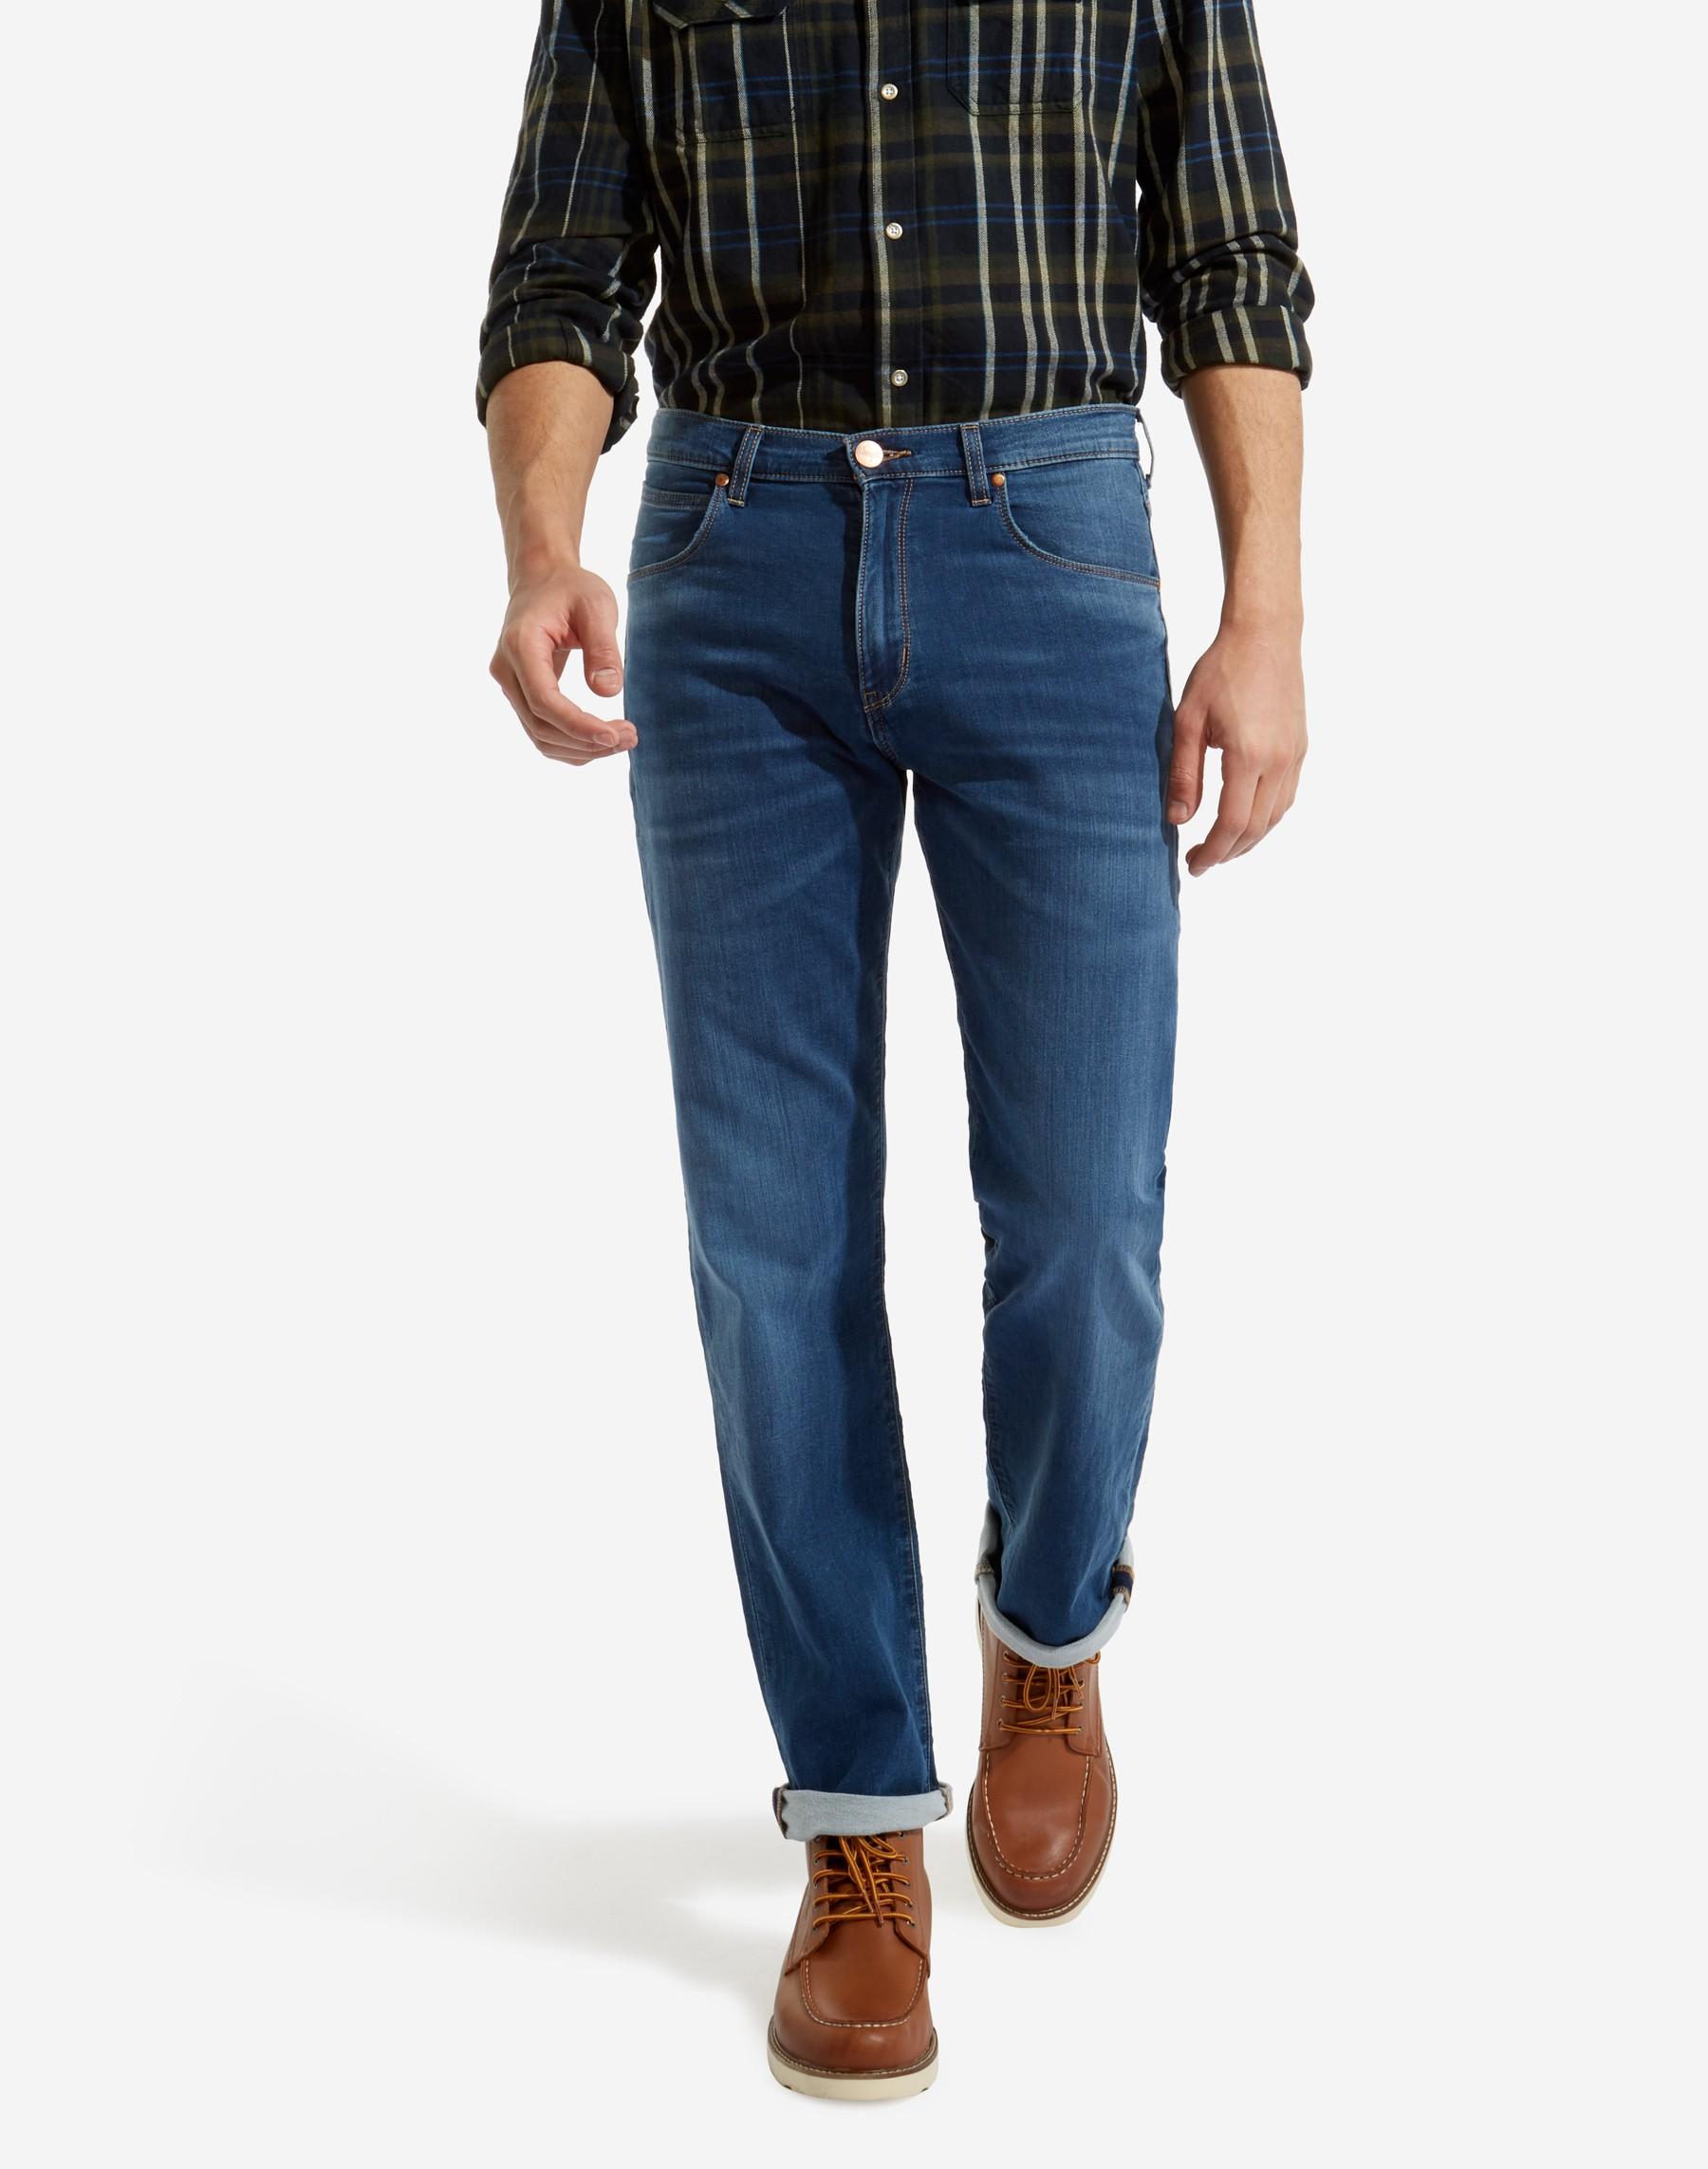 Wrangler pánské džíny Arizona W12OBW20F Modrá W36 L34 88f92a2457